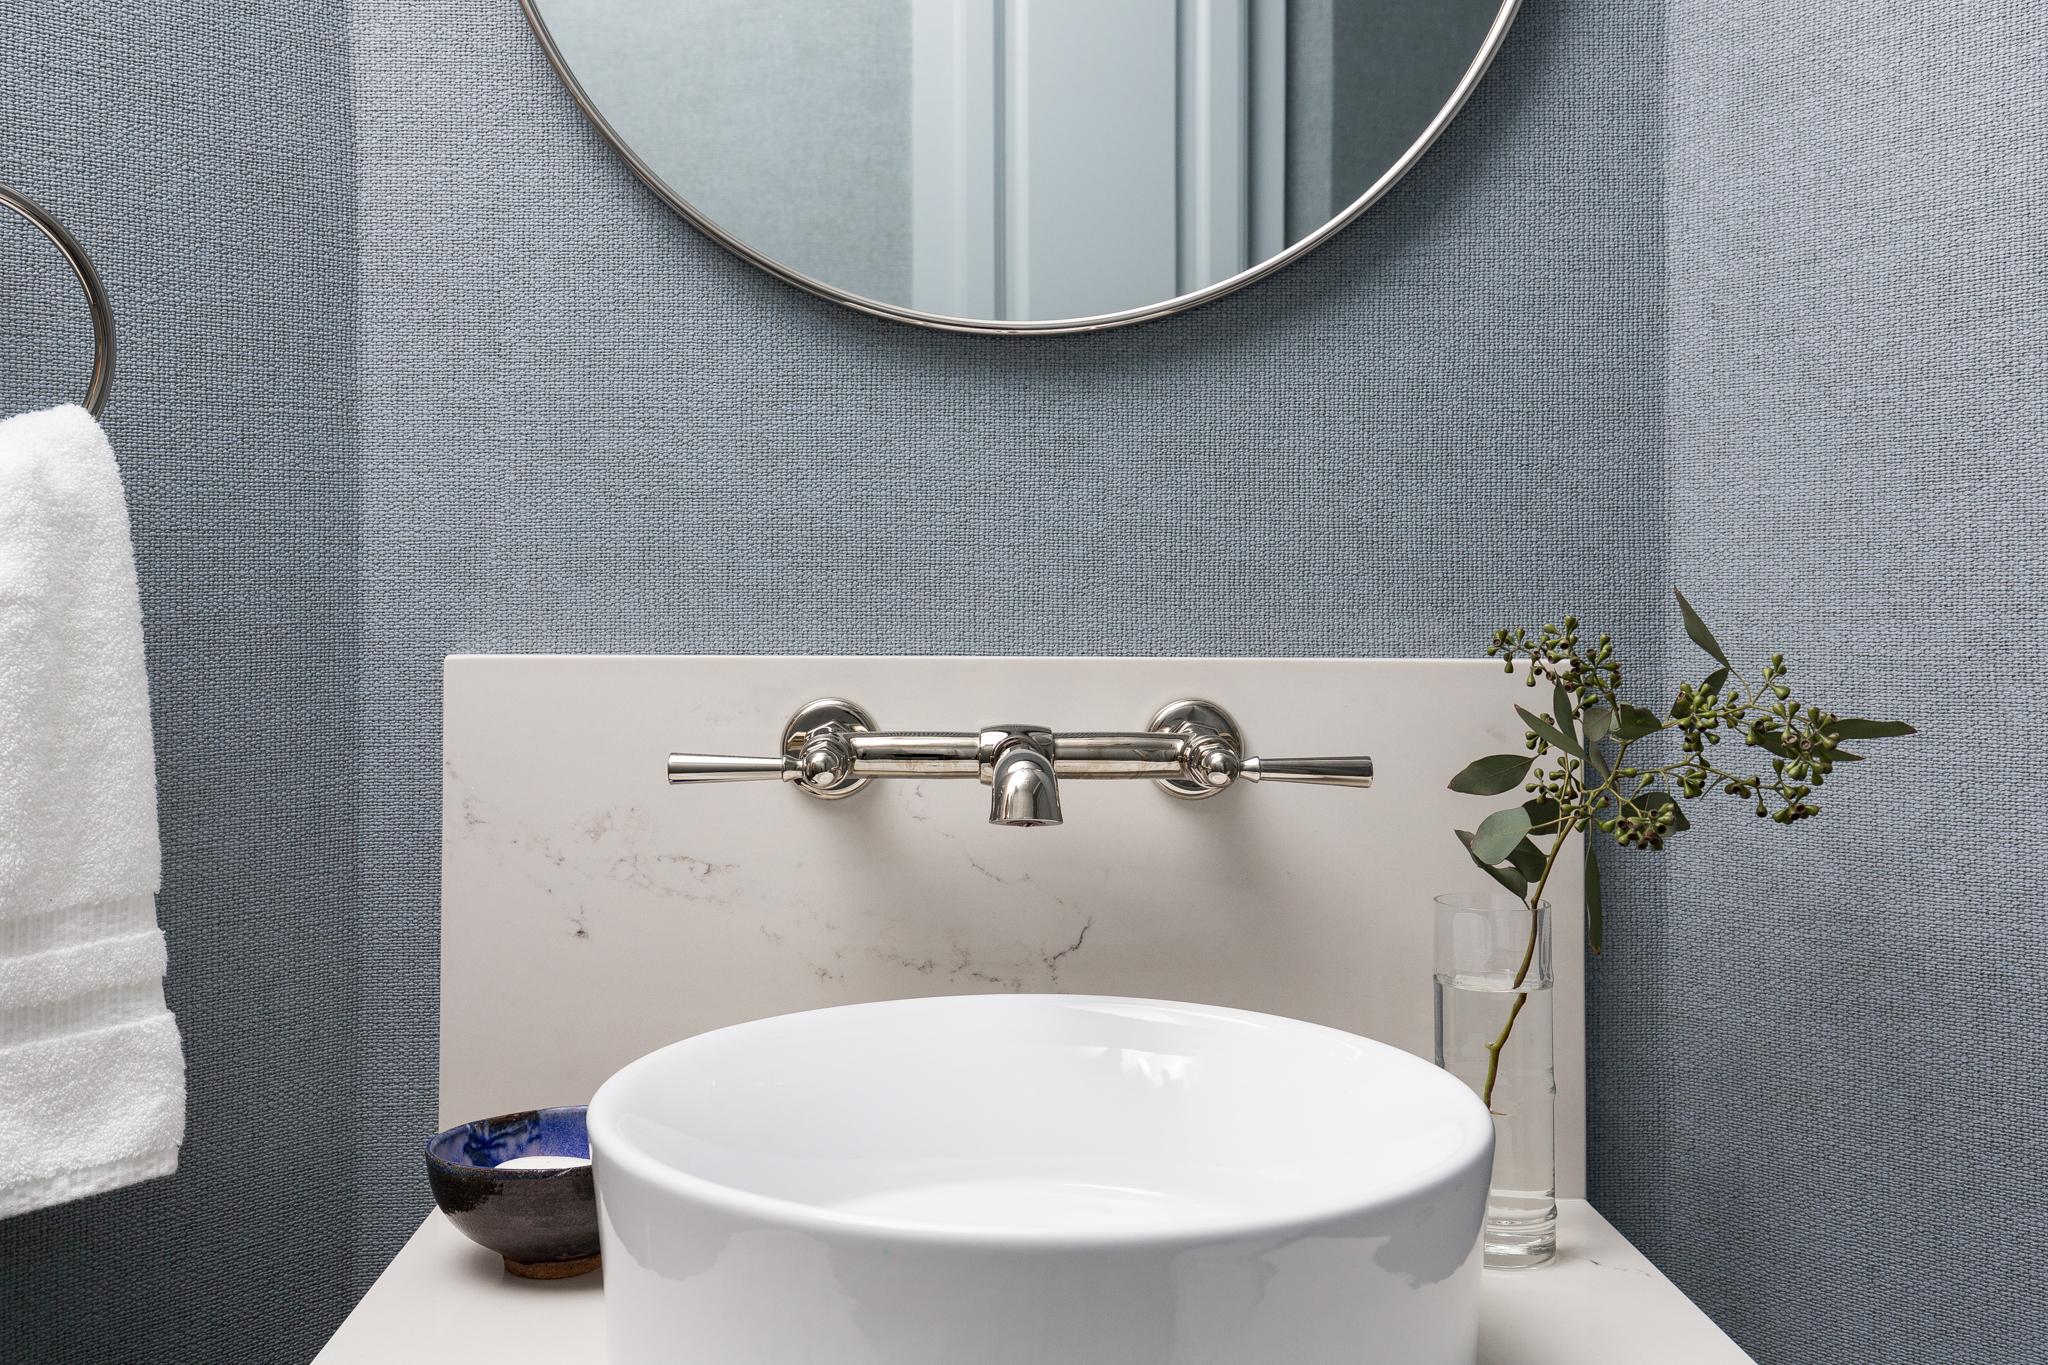 Family Friendly Powder Bath Remodel | Carla Aston, Designer | Colleen Scott, Photographer #powderbath #powderroom #wallmountfaucet #vesselsink